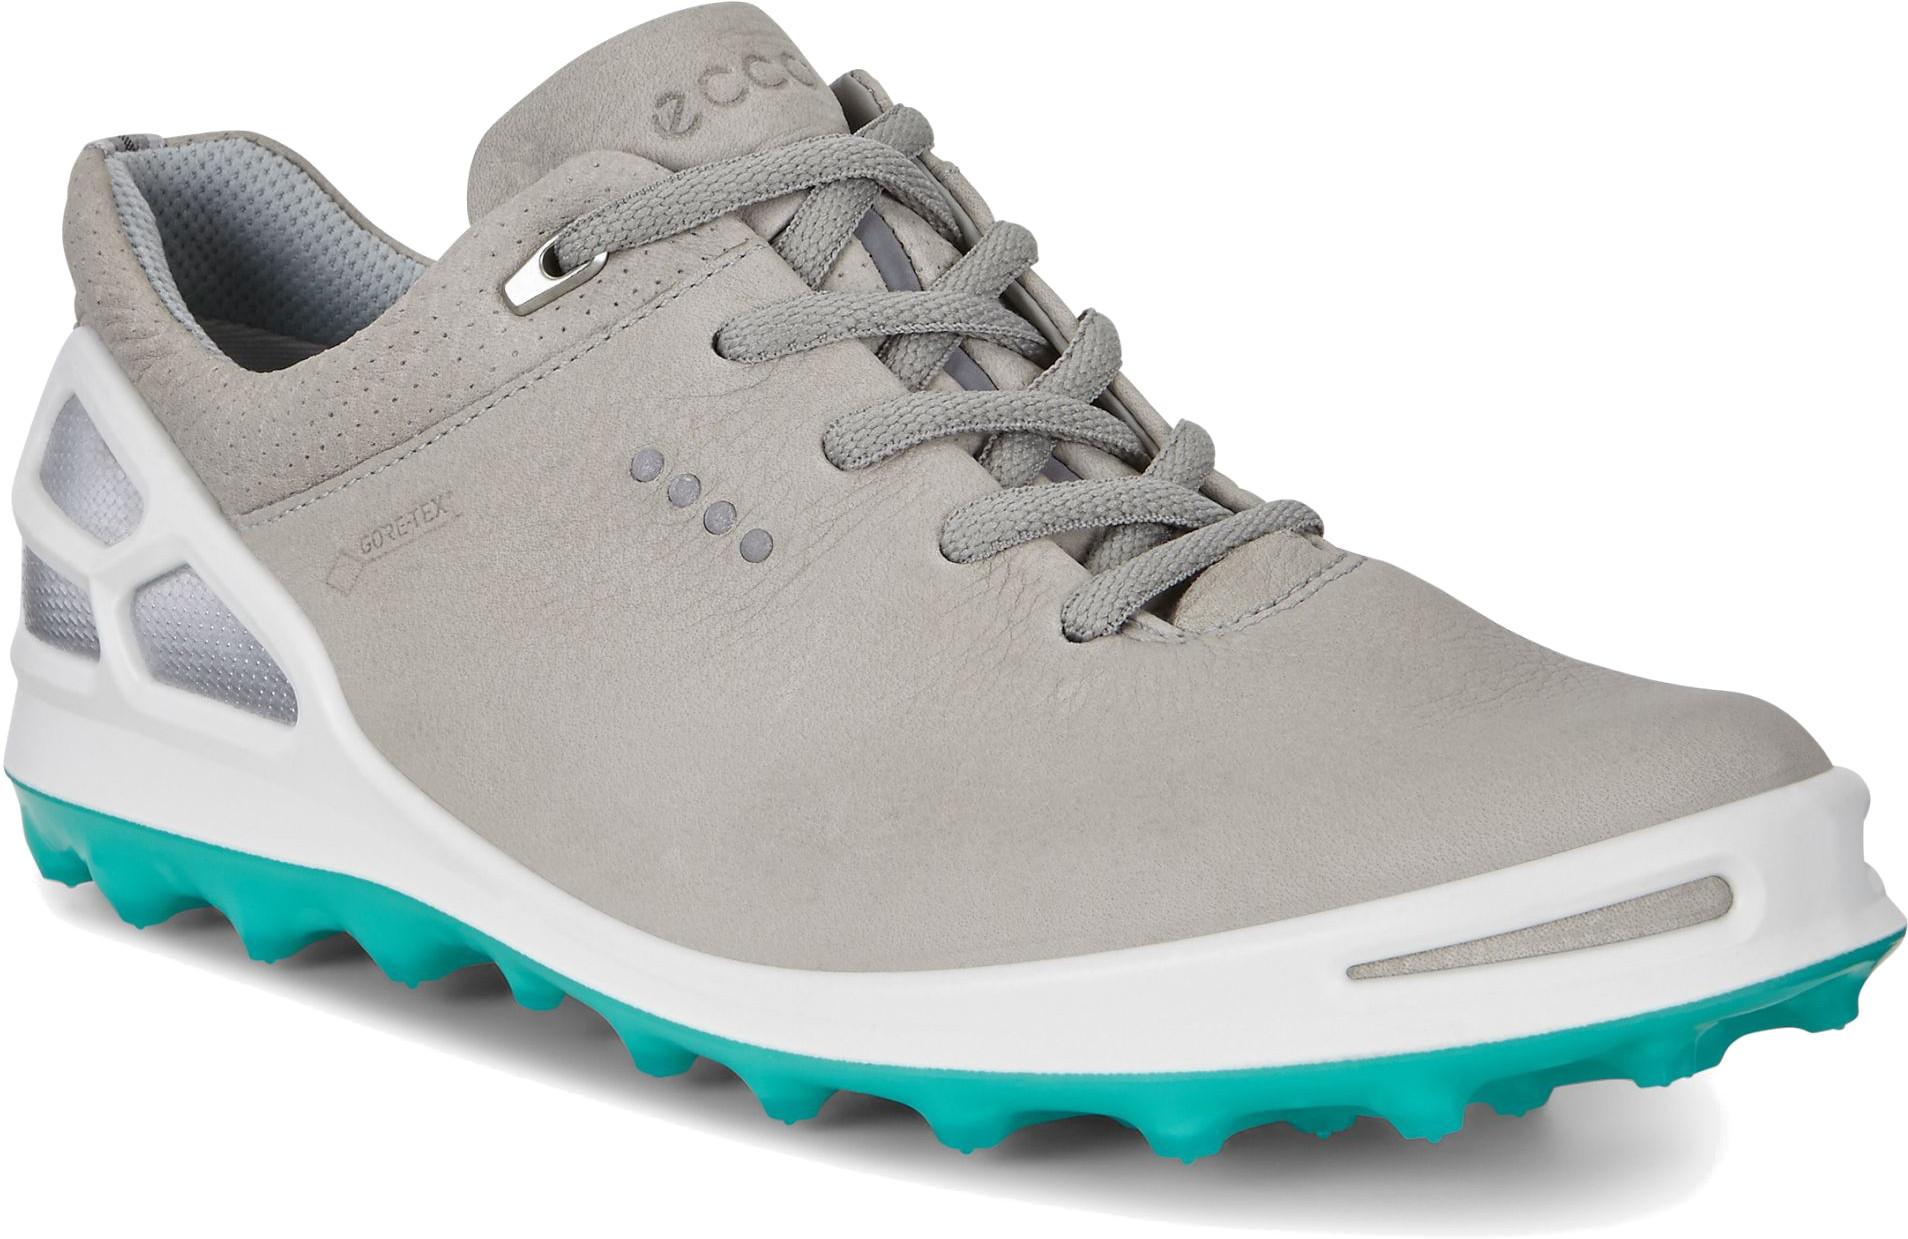 Ecco Biom Cage Pro Golfschuhe Damen Wild DovePorcelain Green 38